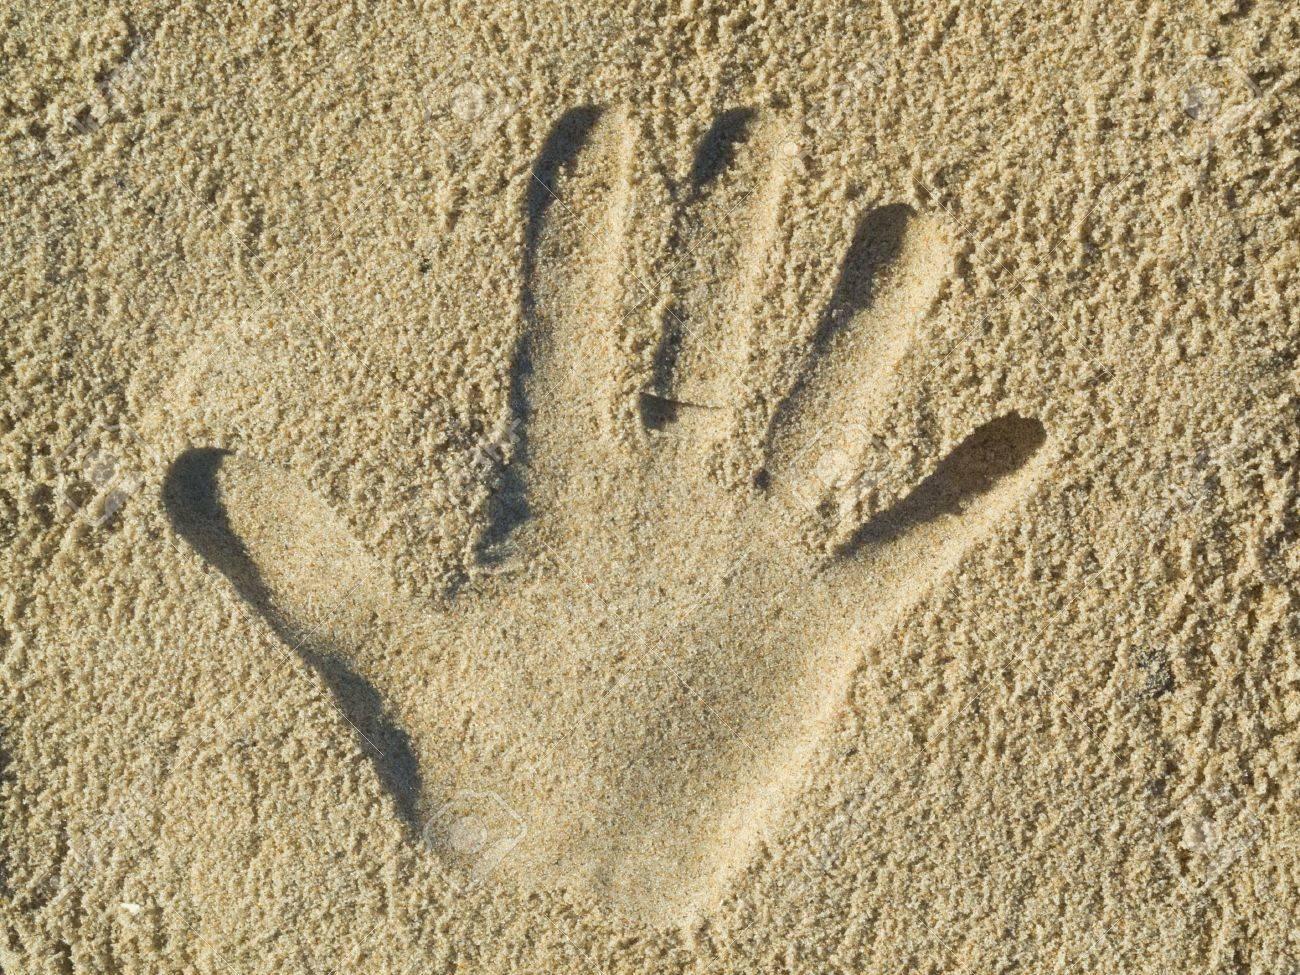 Optische Täuschung - Handschrift in den Sand Standard-Bild - 13284991